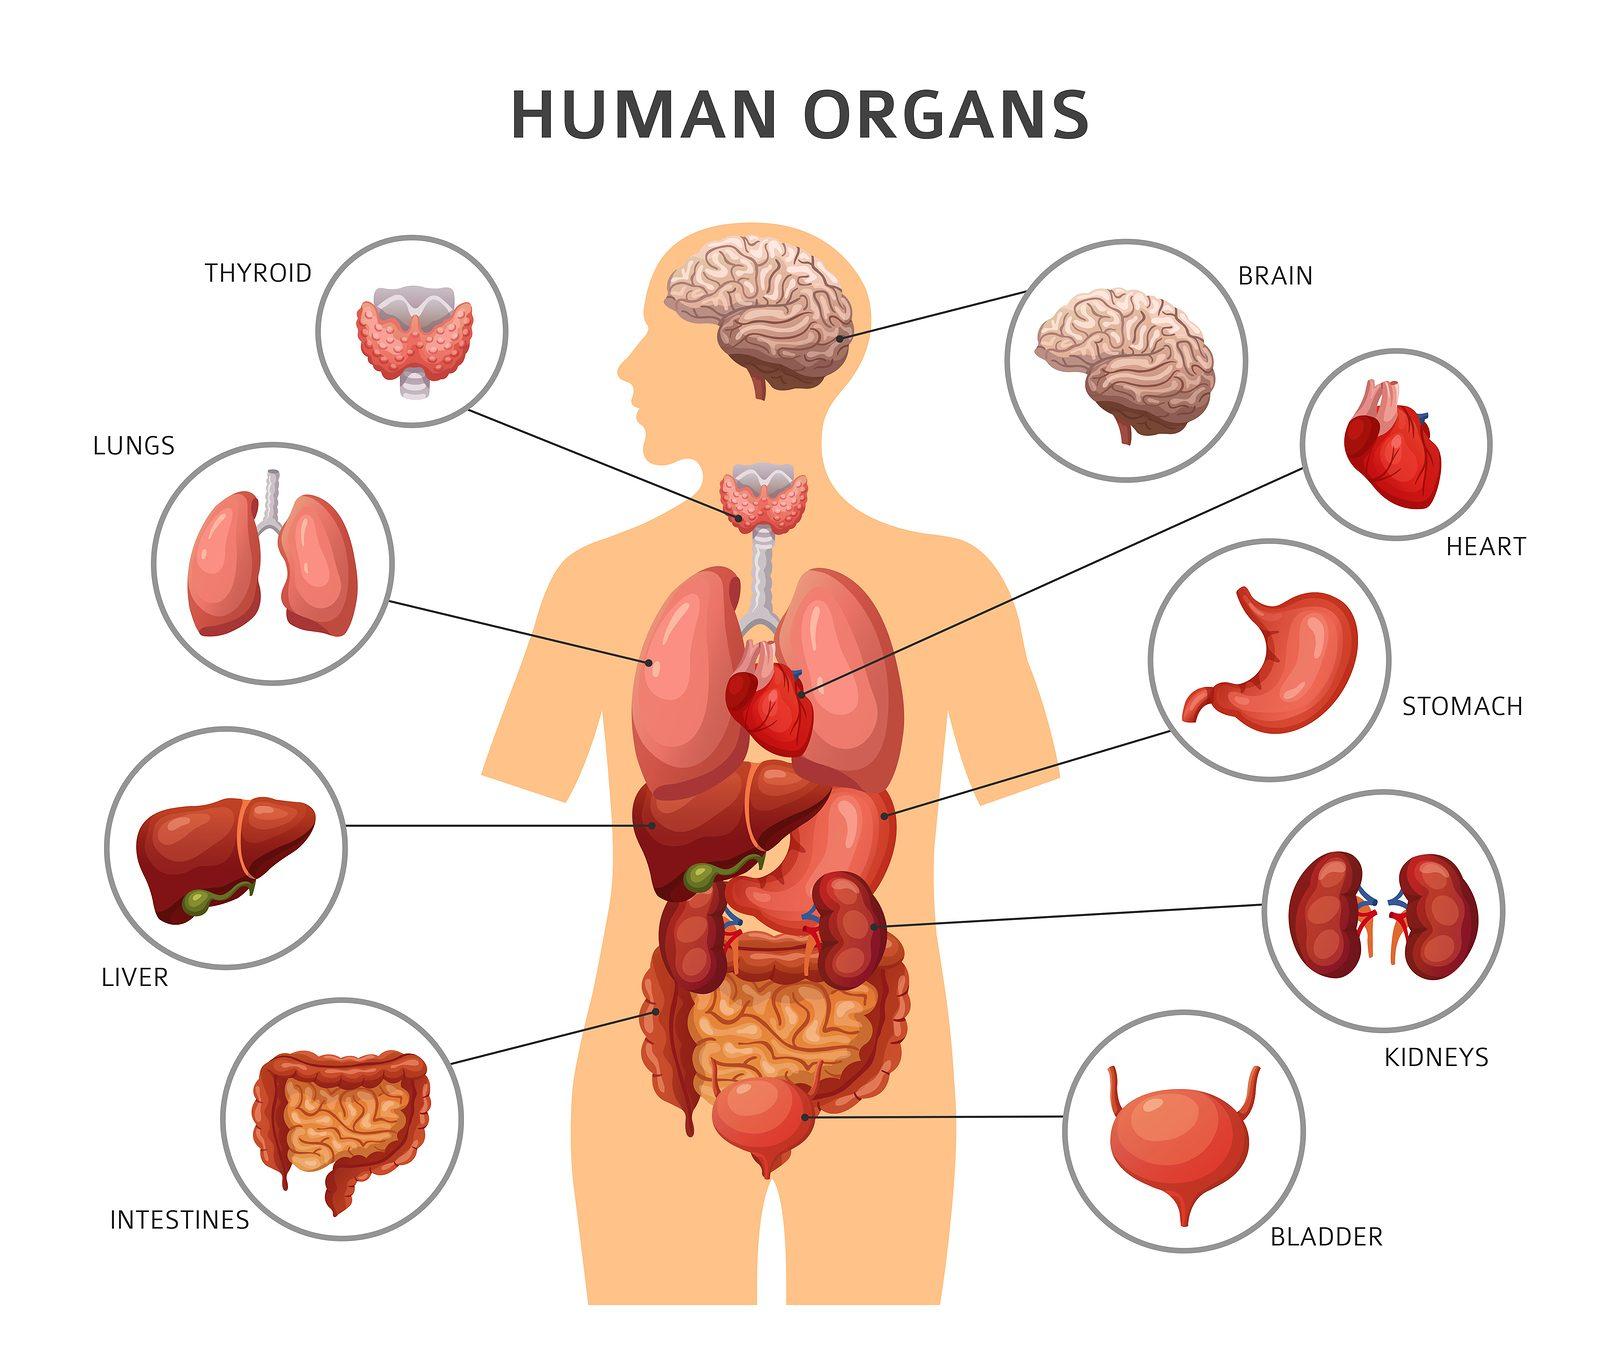 Bioprinting Human Organs